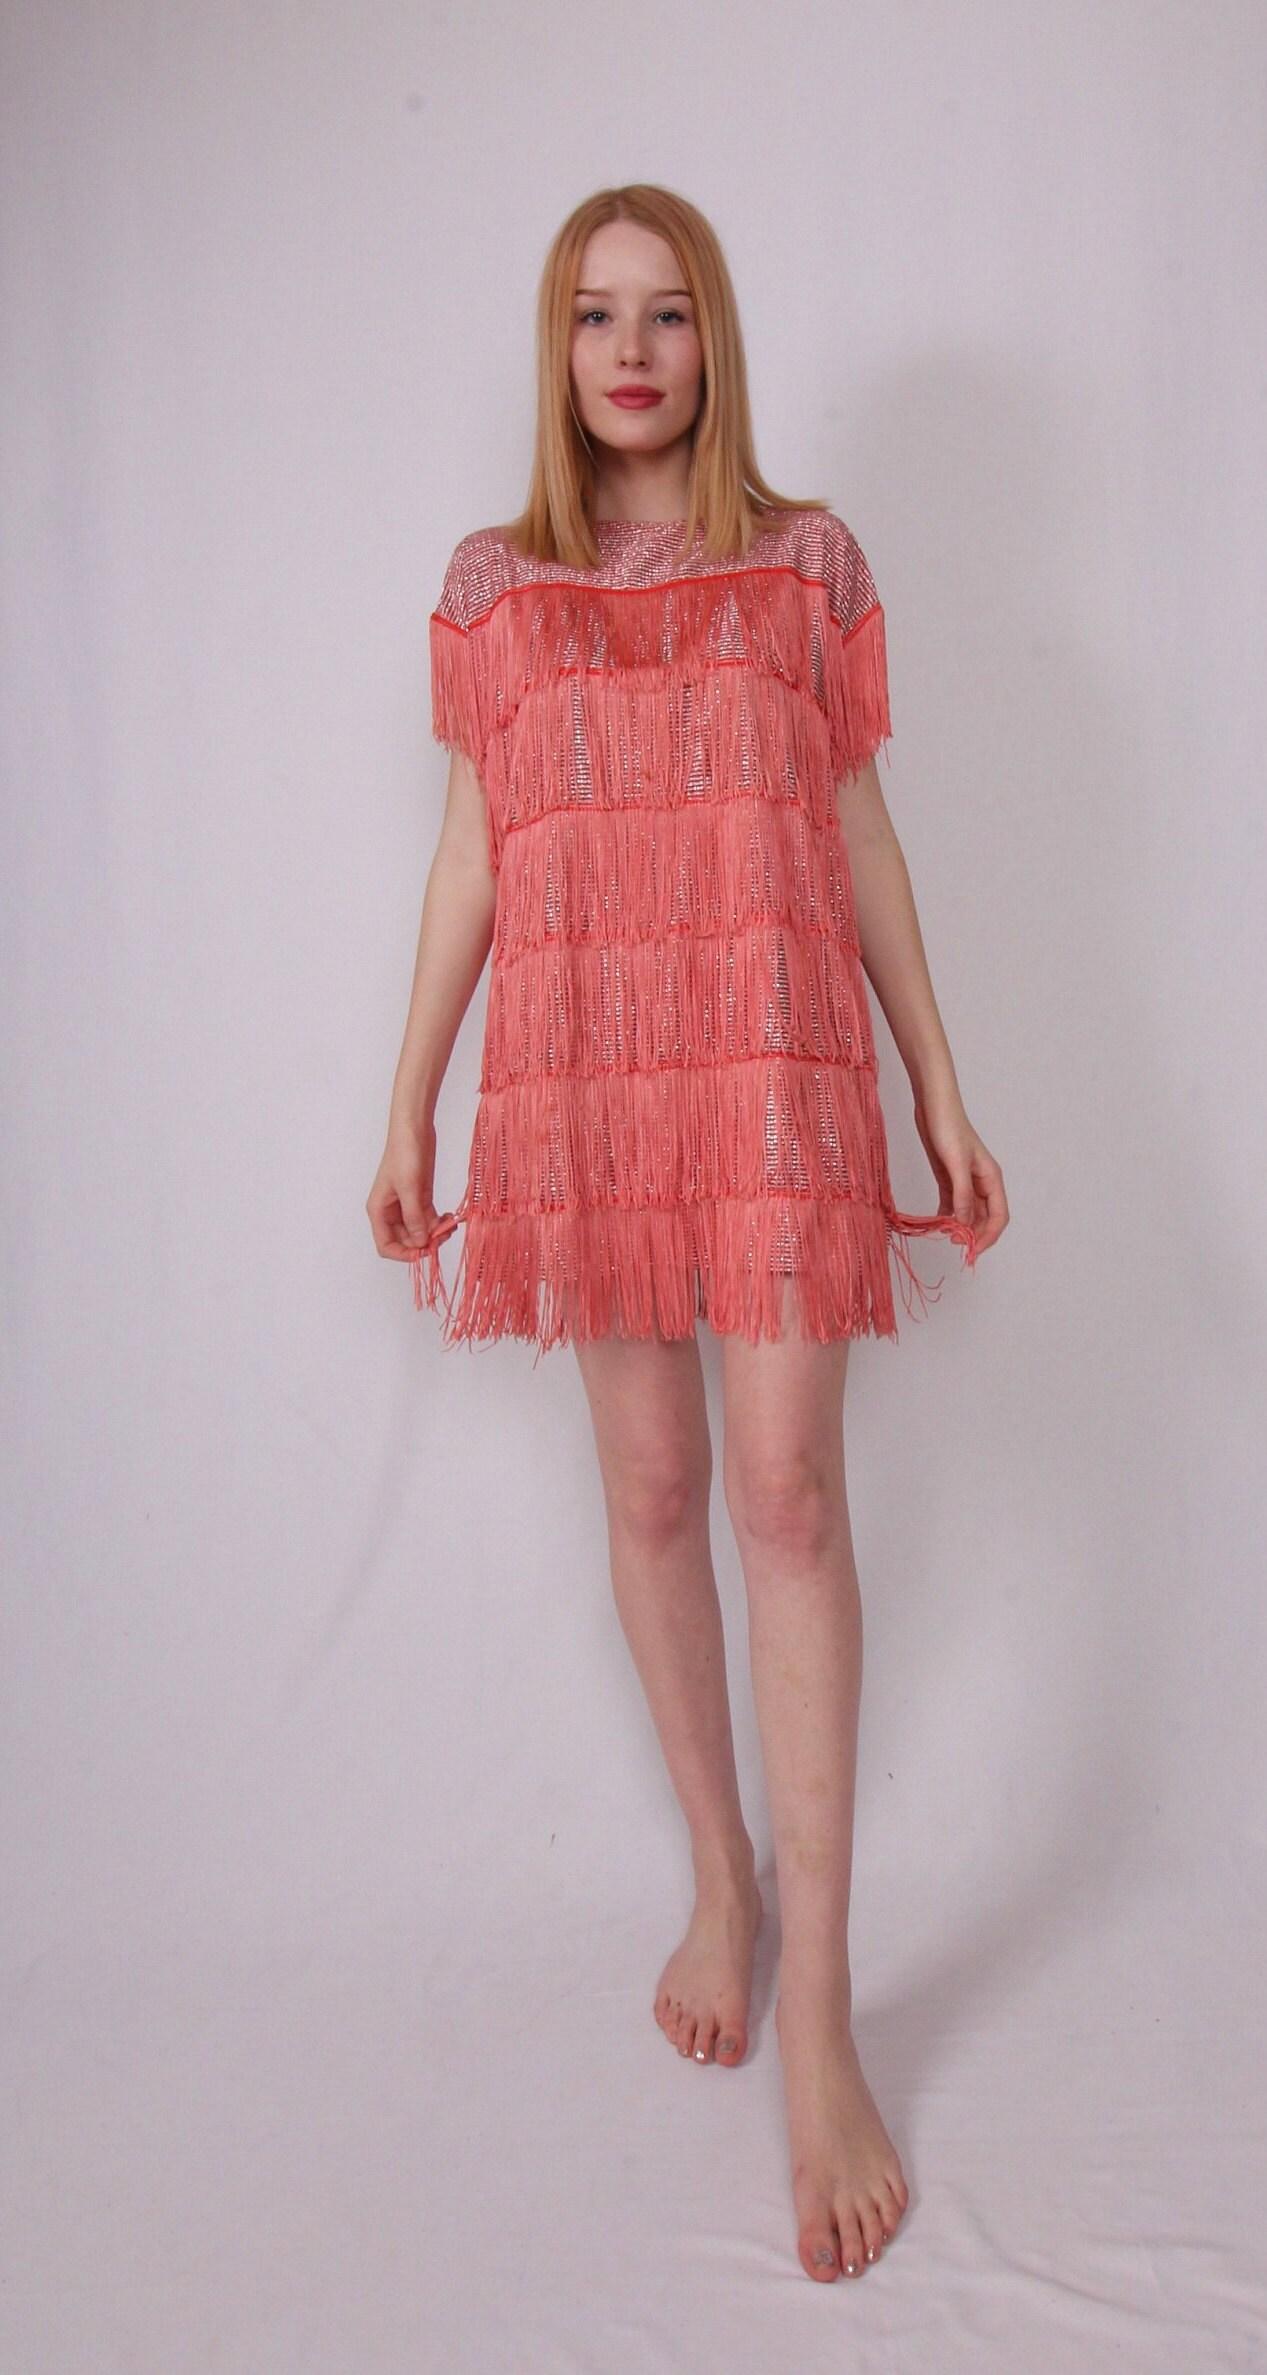 bf77cb55ac Vintage 1960's Fun Fringe Dress Shirt | Red and Silver Metallic ...